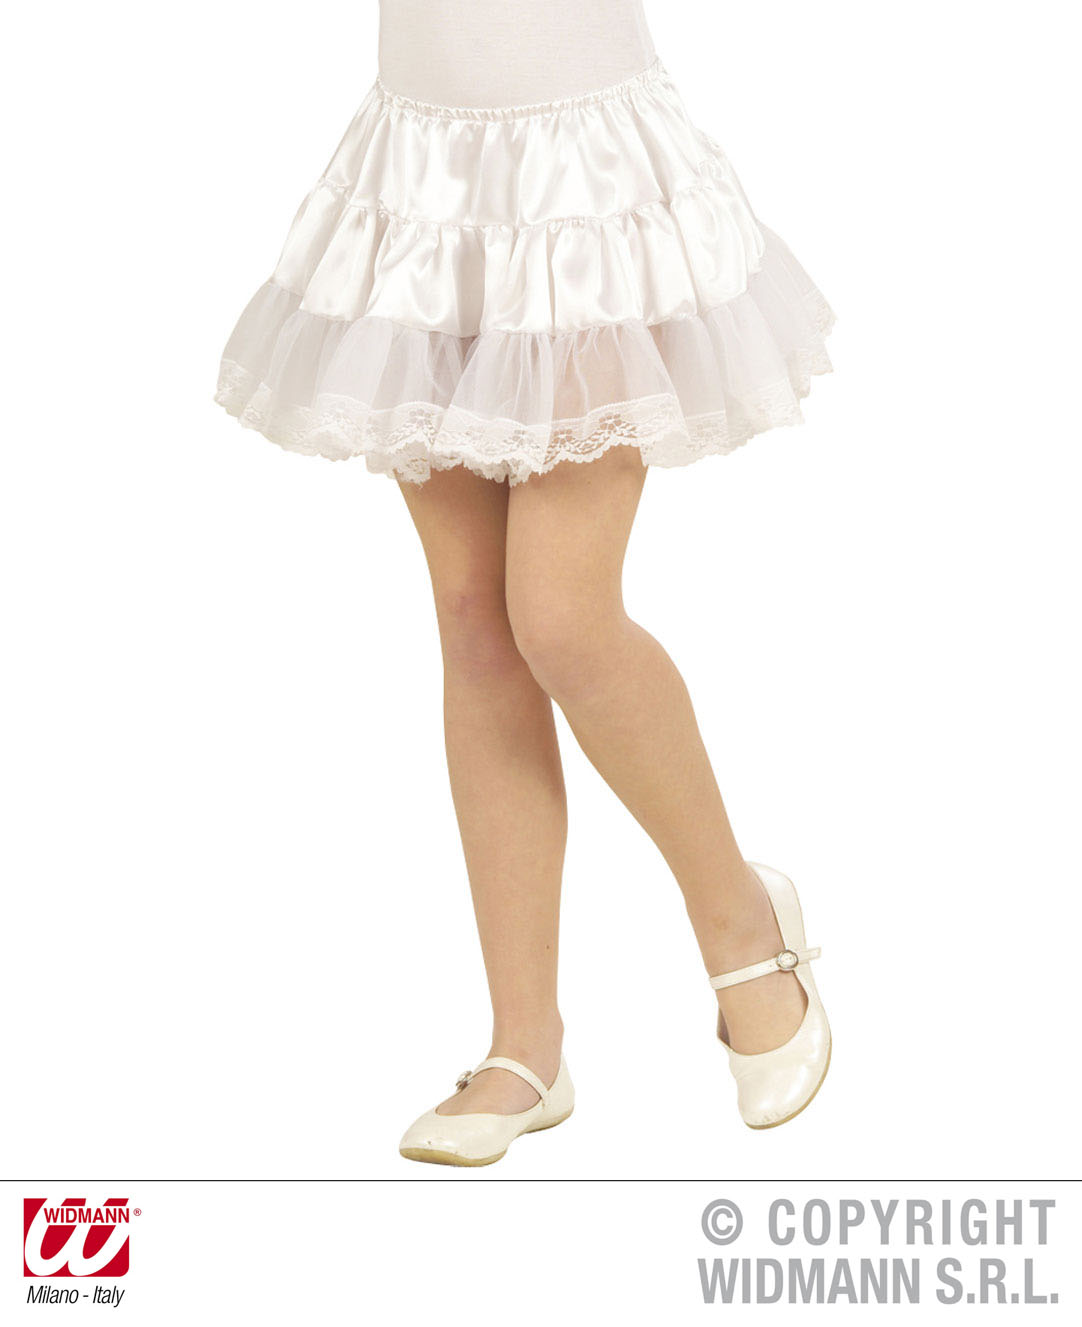 Satin Petticoat Unterrock, kurz, weiß  Kinder, Mädchen  3361